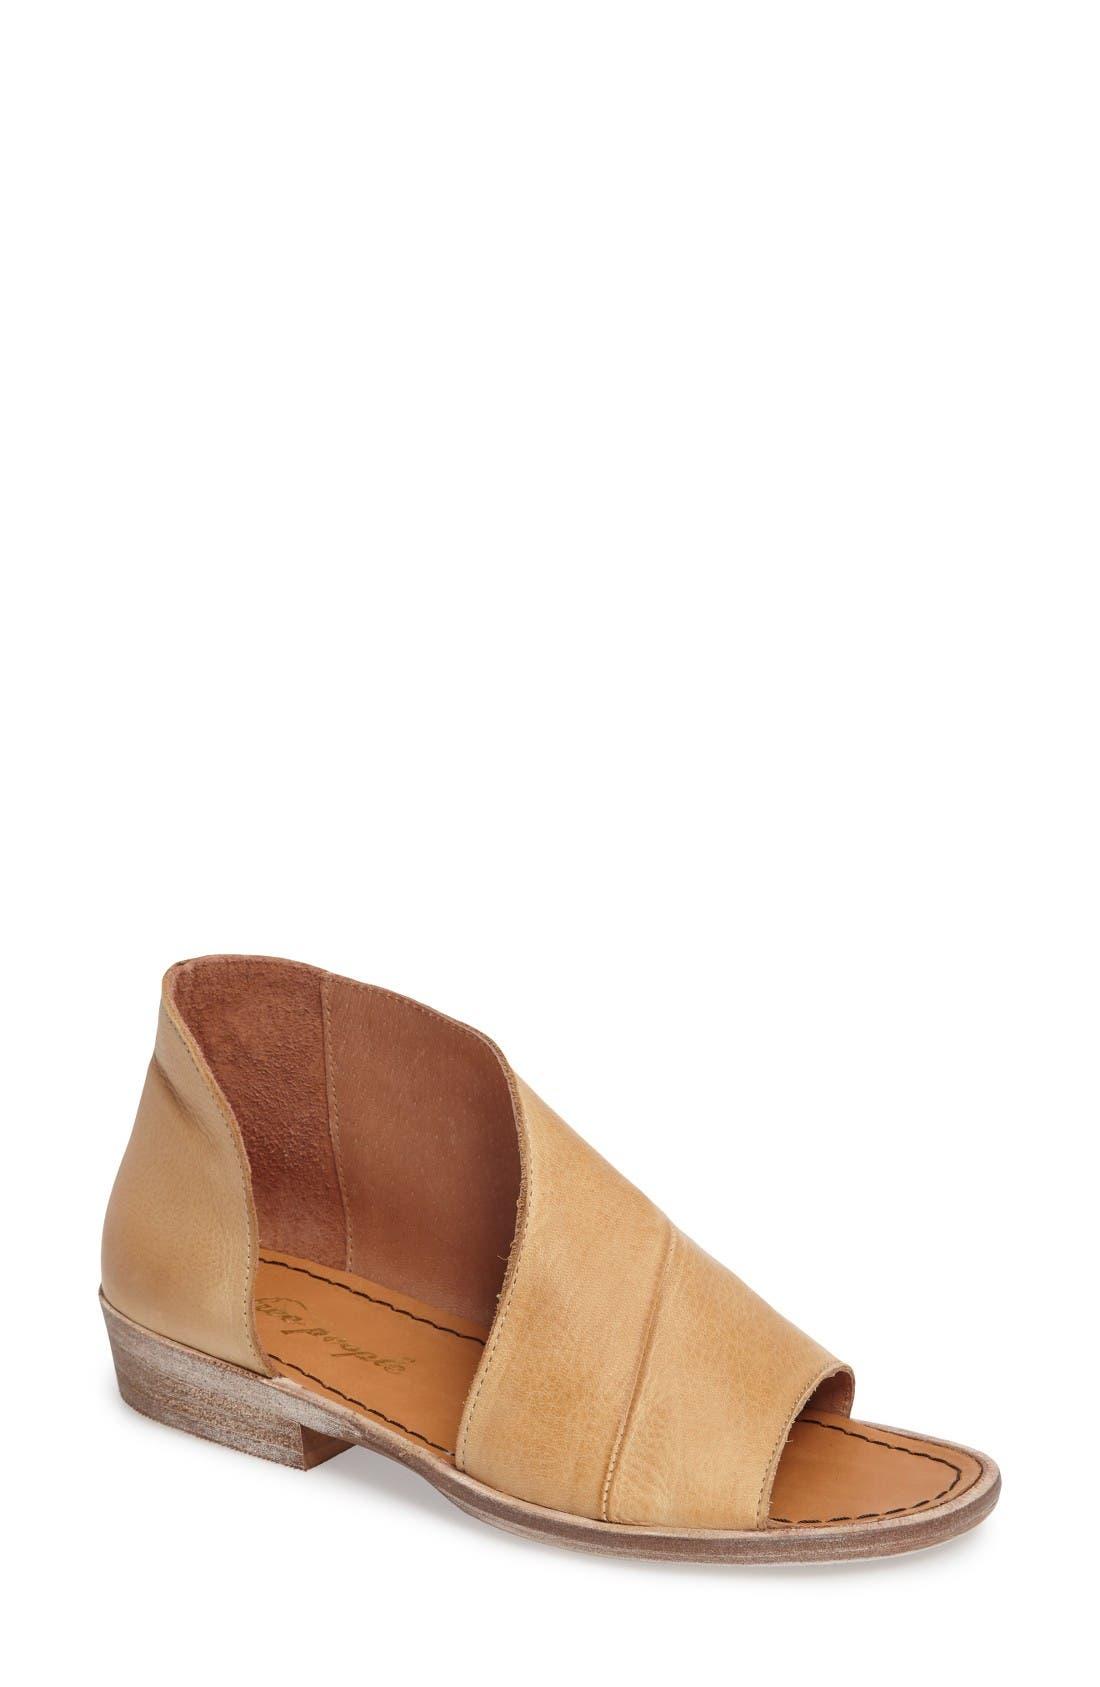 'Mont Blanc' Asymmetrical Sandal,                             Main thumbnail 1, color,                             Natural Leather